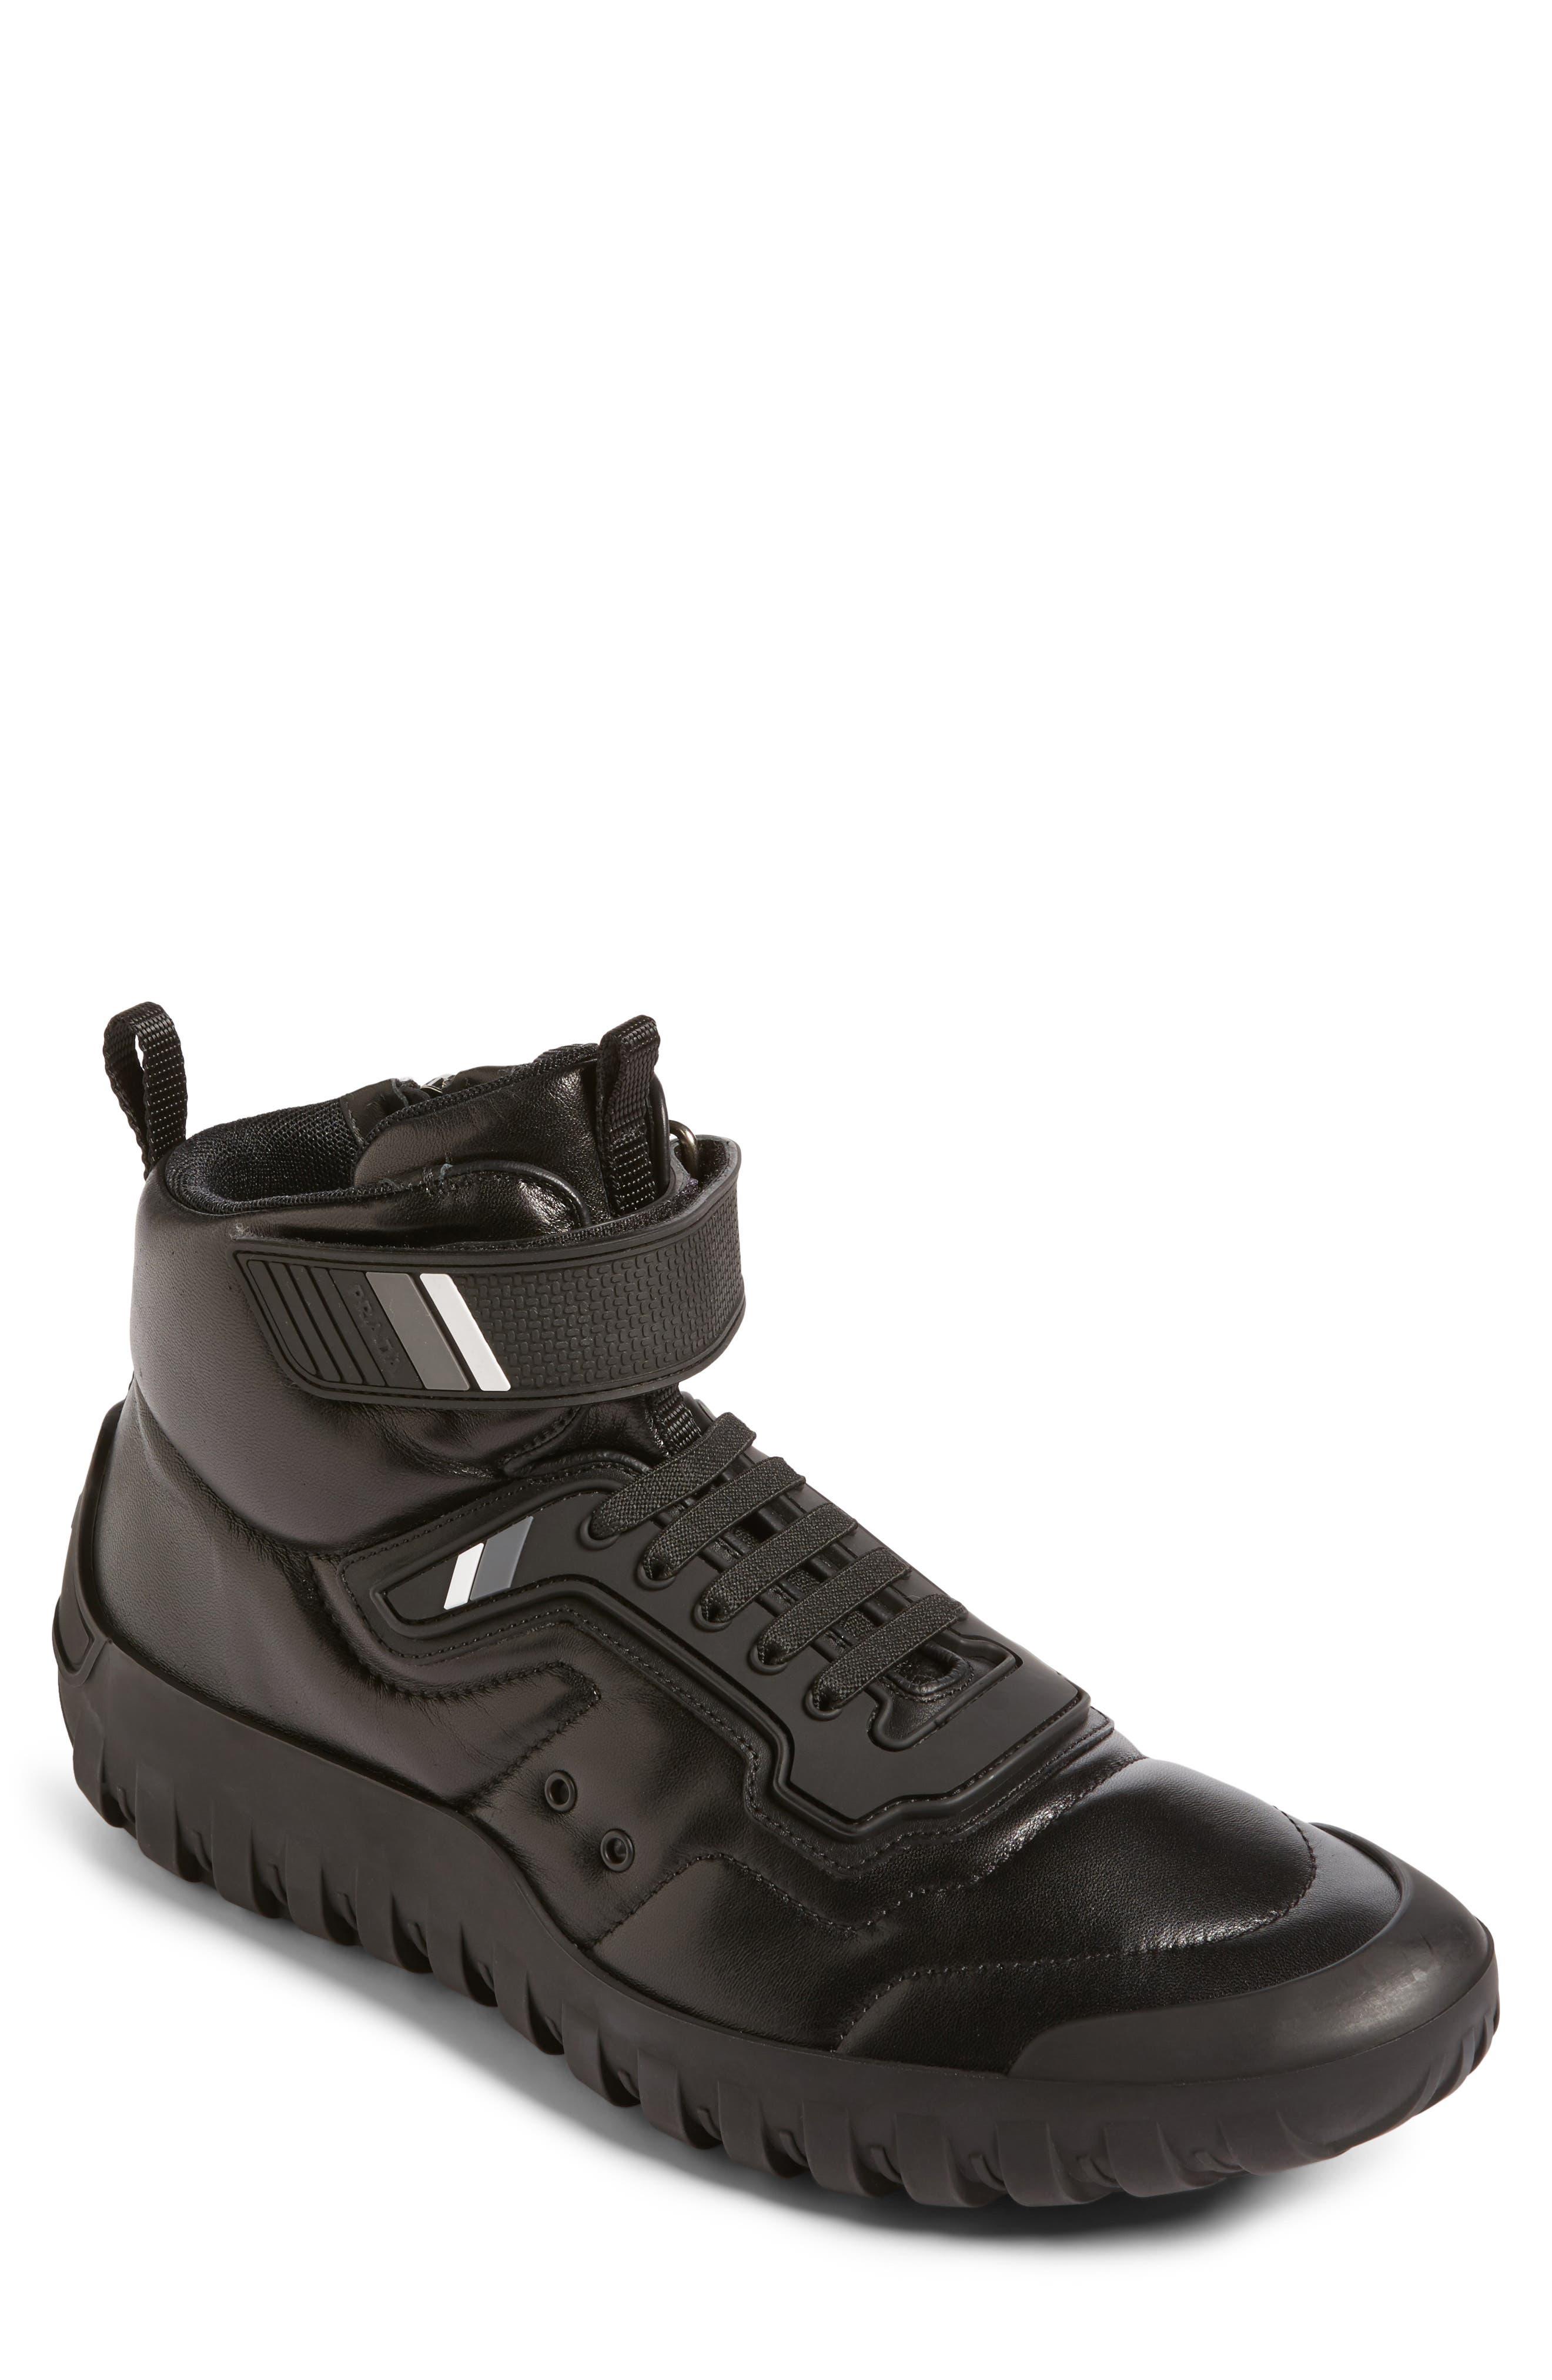 Alternate Image 1 Selected - Prada Linea Rossa Tech Strap Sneaker (Men)